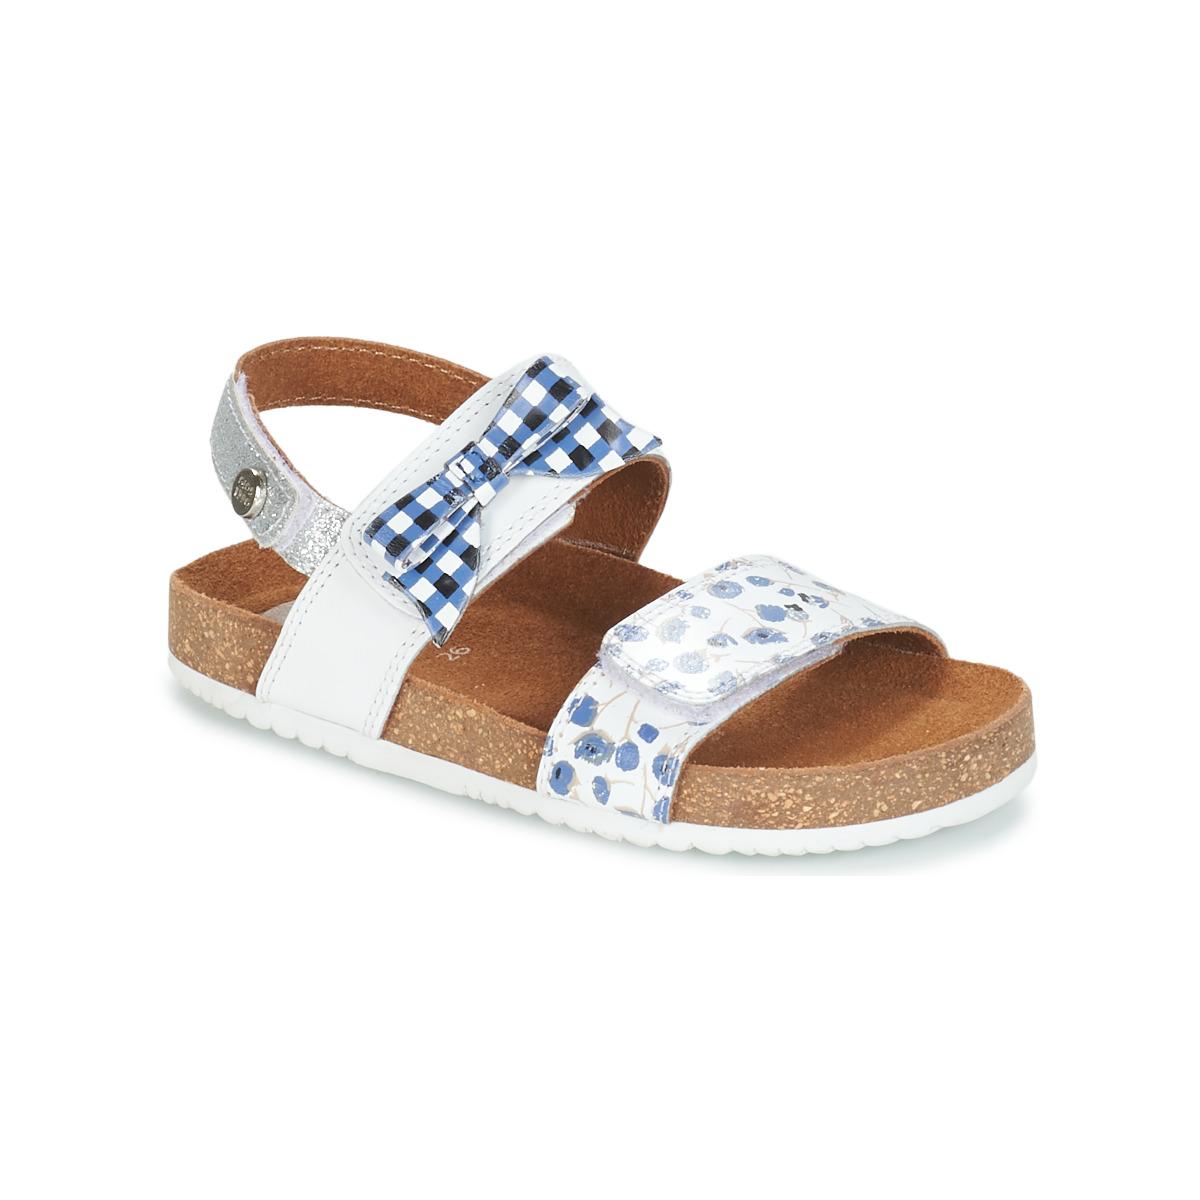 finest selection 240f7 25b04 Gioseppo Sandali & Odprti čevlji PERPIGNAN Bela